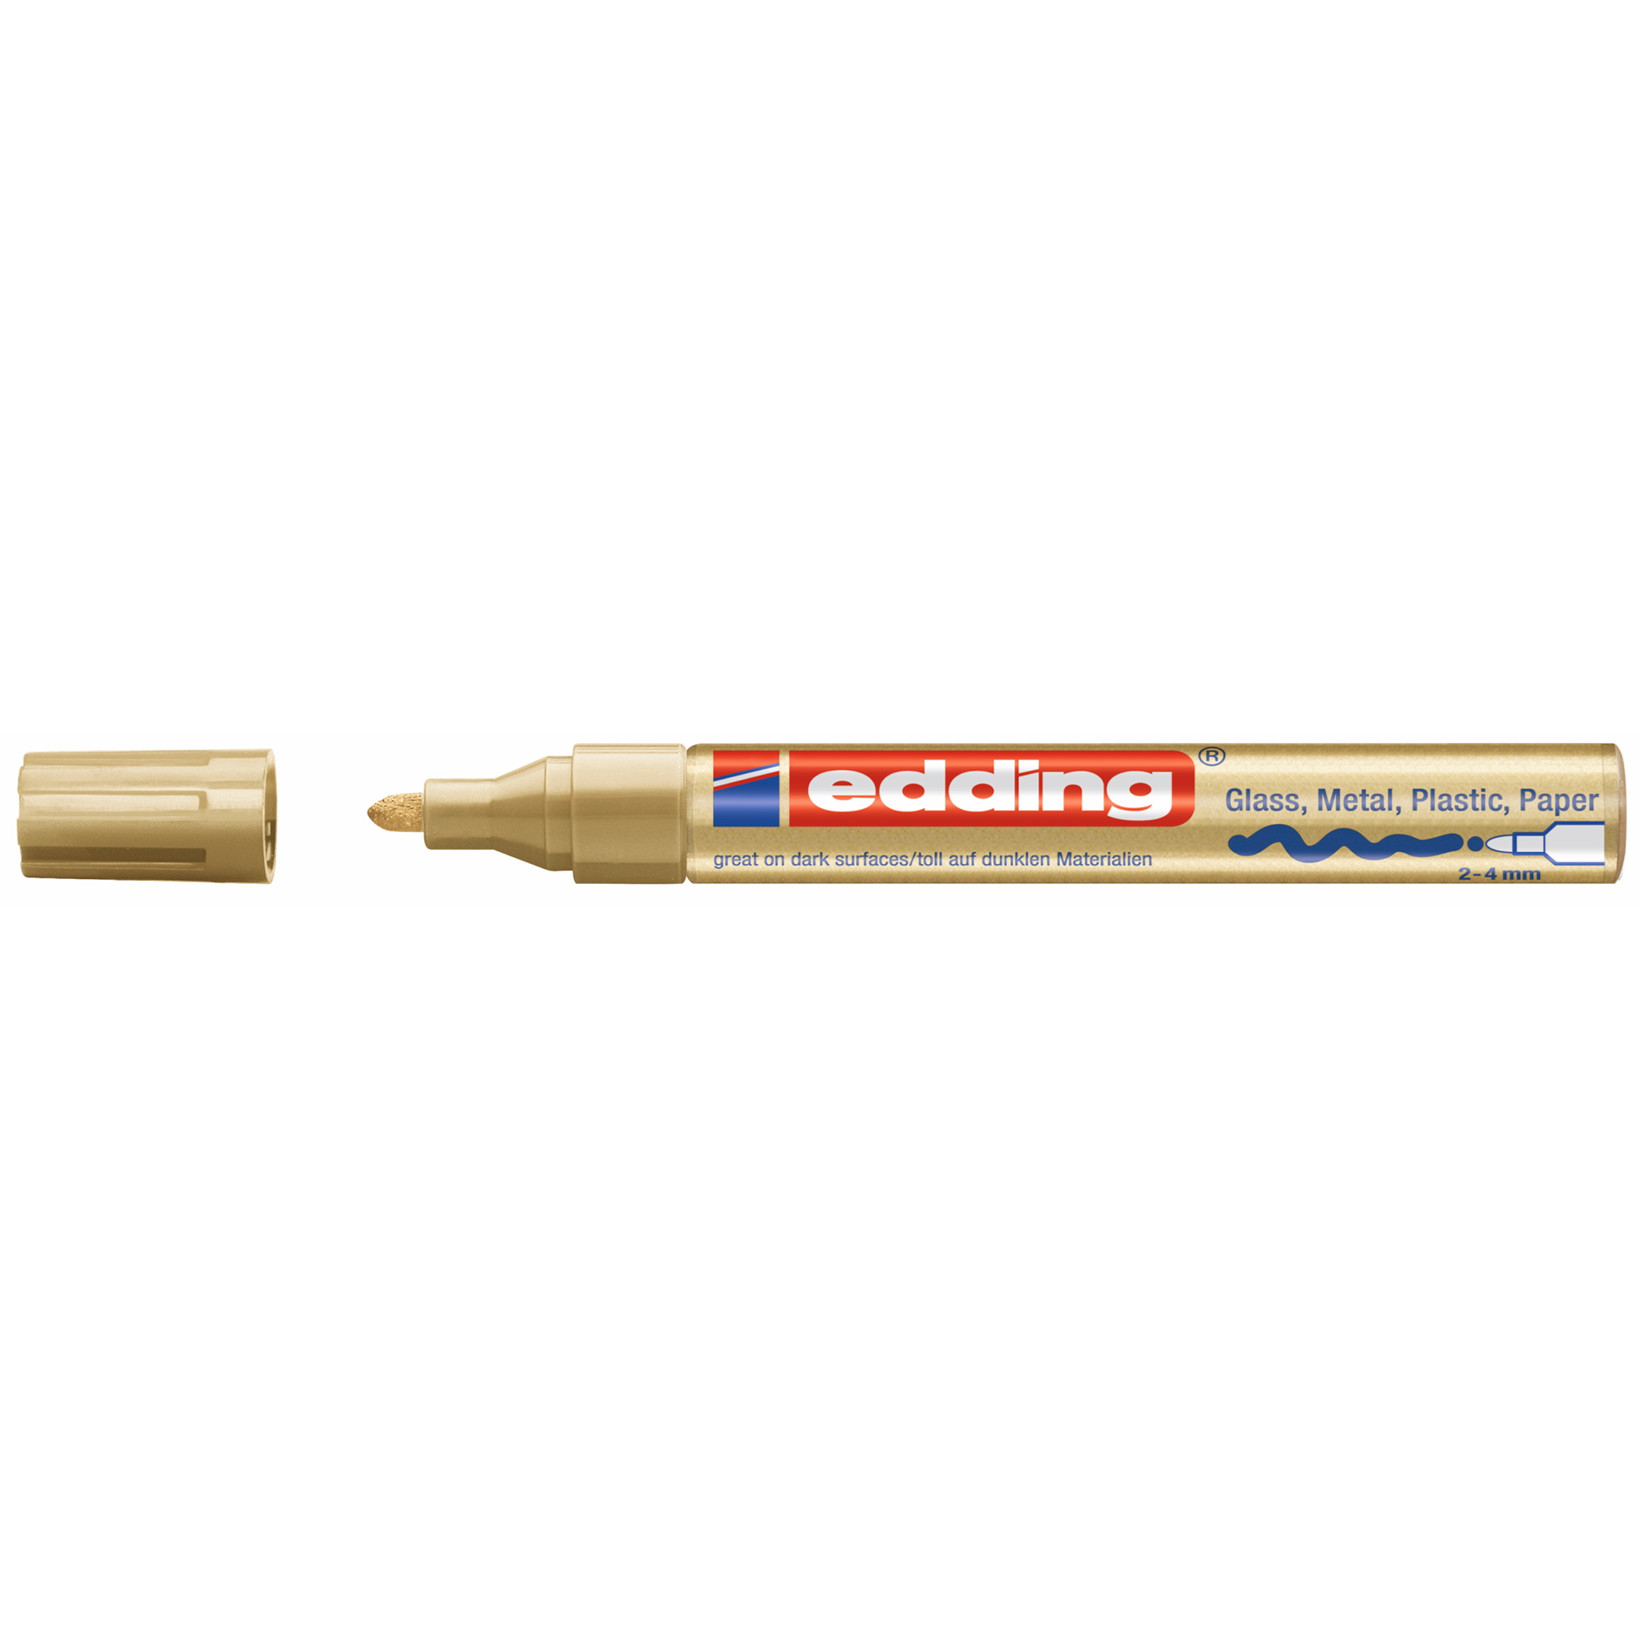 Edding 750 Paint Marker - Guld farve 2-4 mm streg